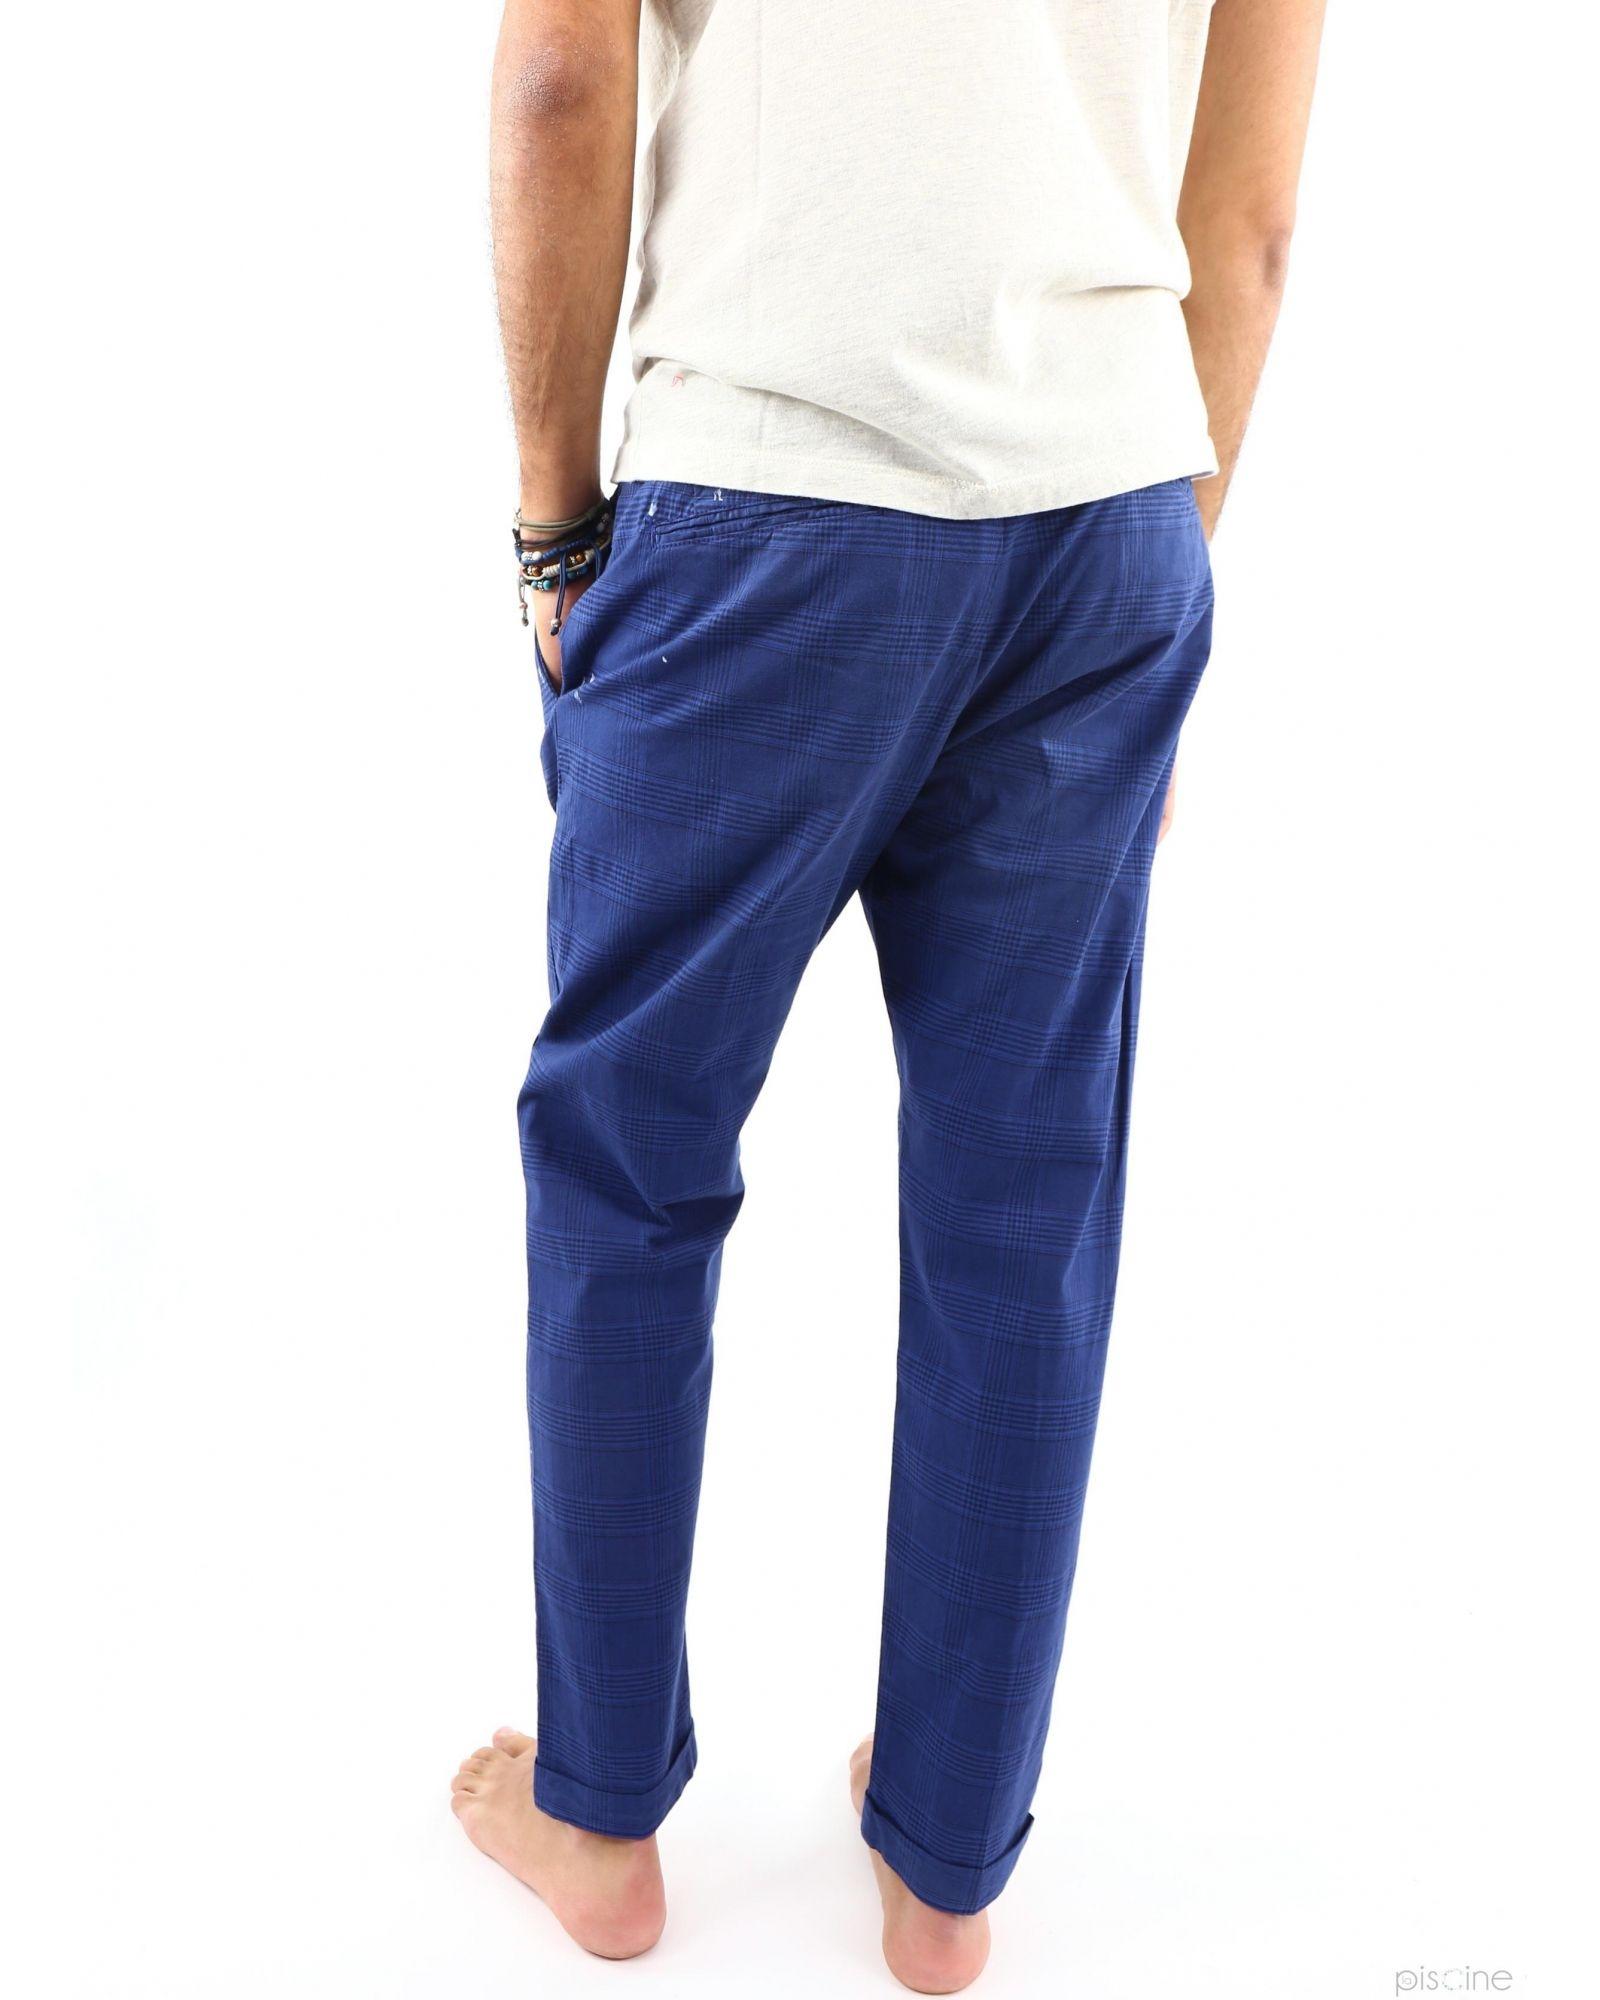 Pantalon à pinces bleu TrueNYC